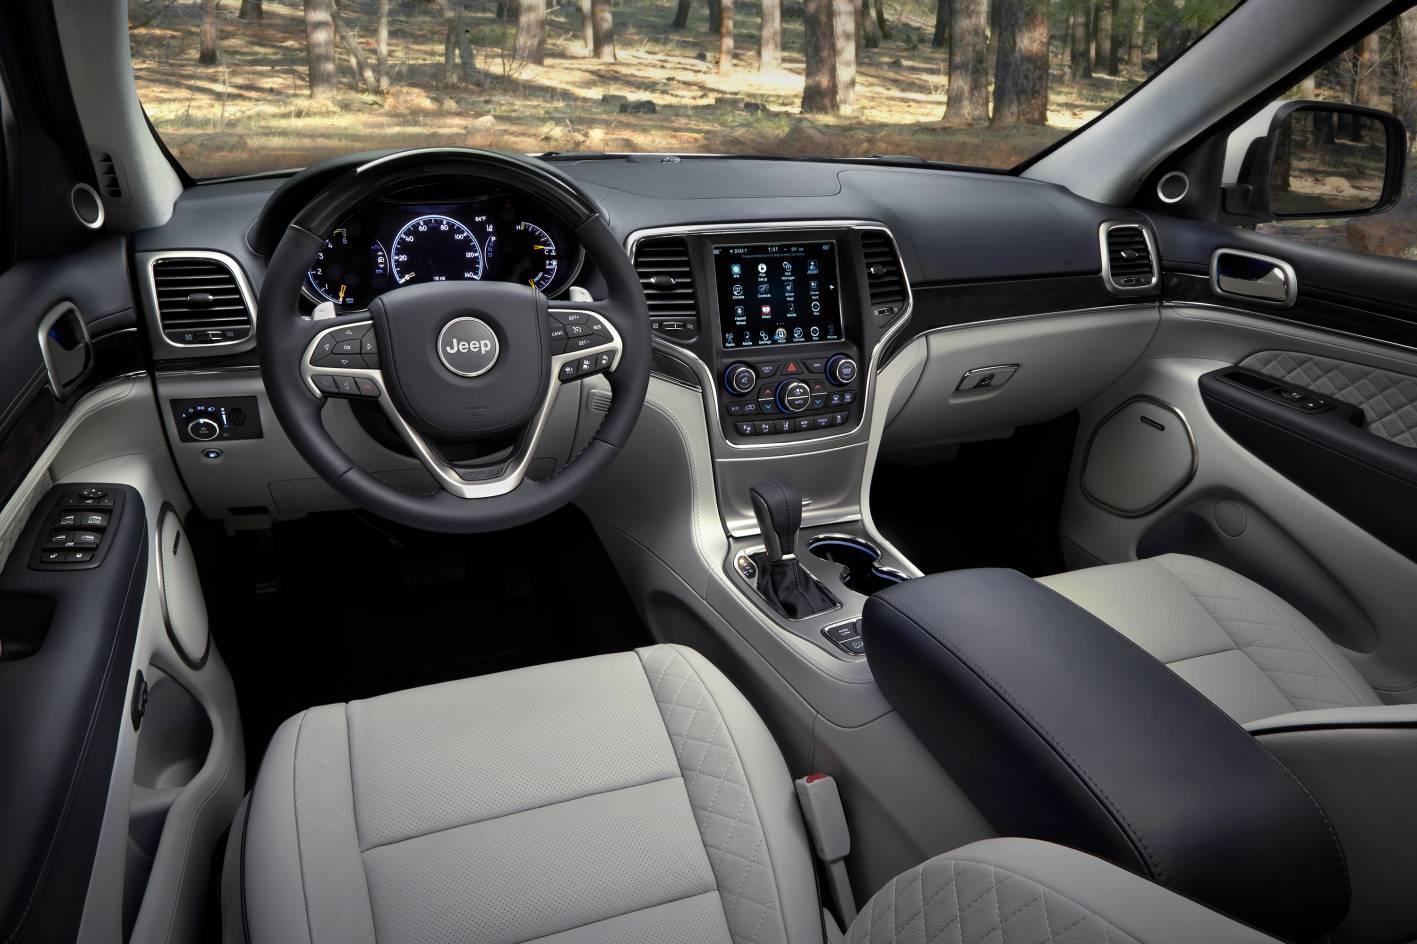 Jeep Grand Cherokee Msrp >> Pat Callinan S 4x4 Adventures The Essence Of 4x4 Adventure